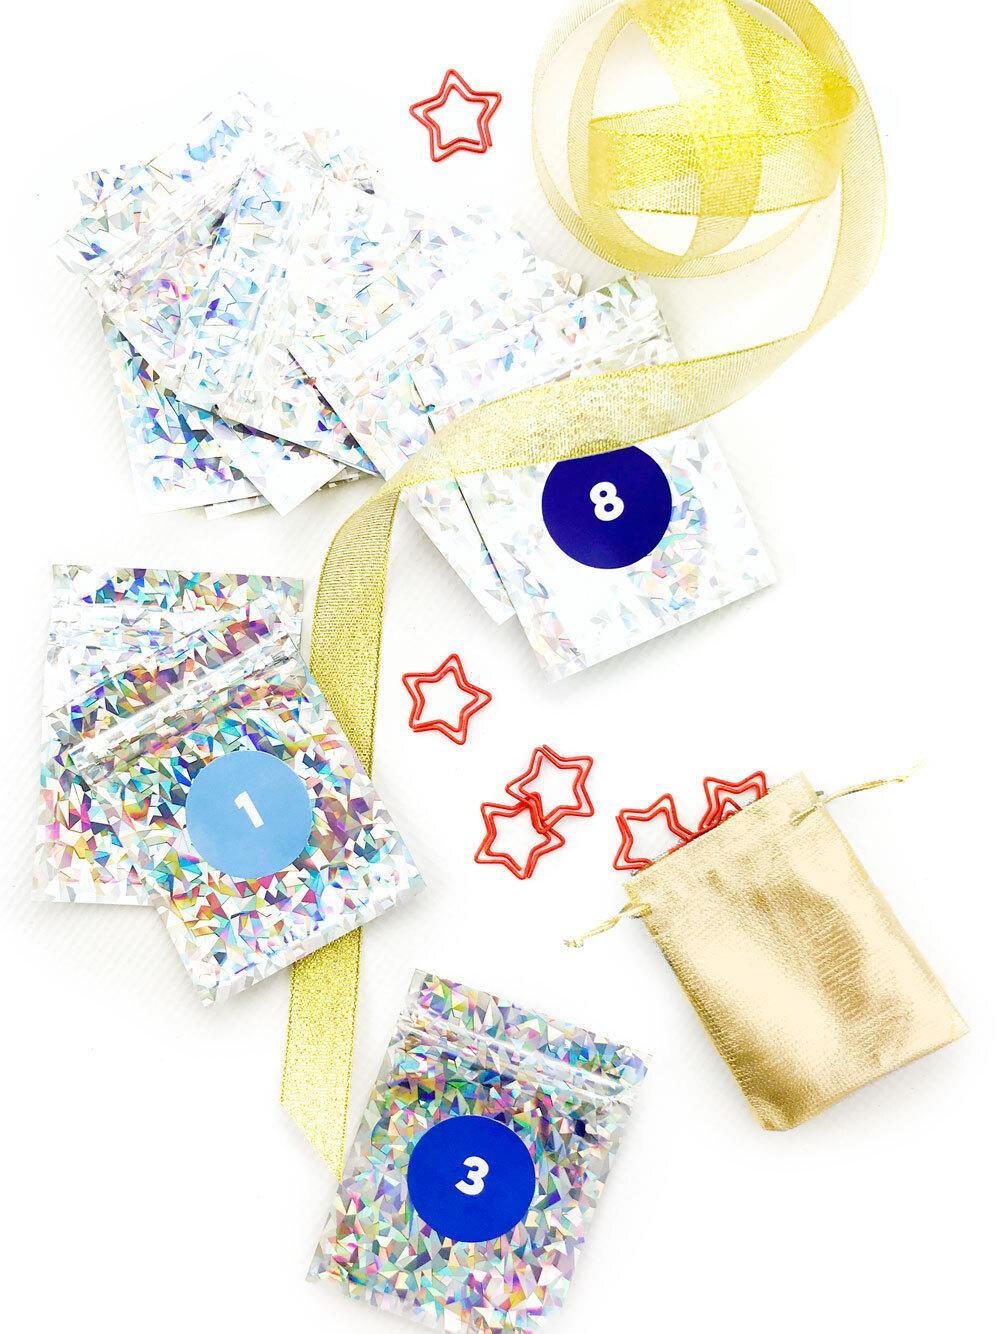 Pipsticks Advent Calendar – On Sale Now